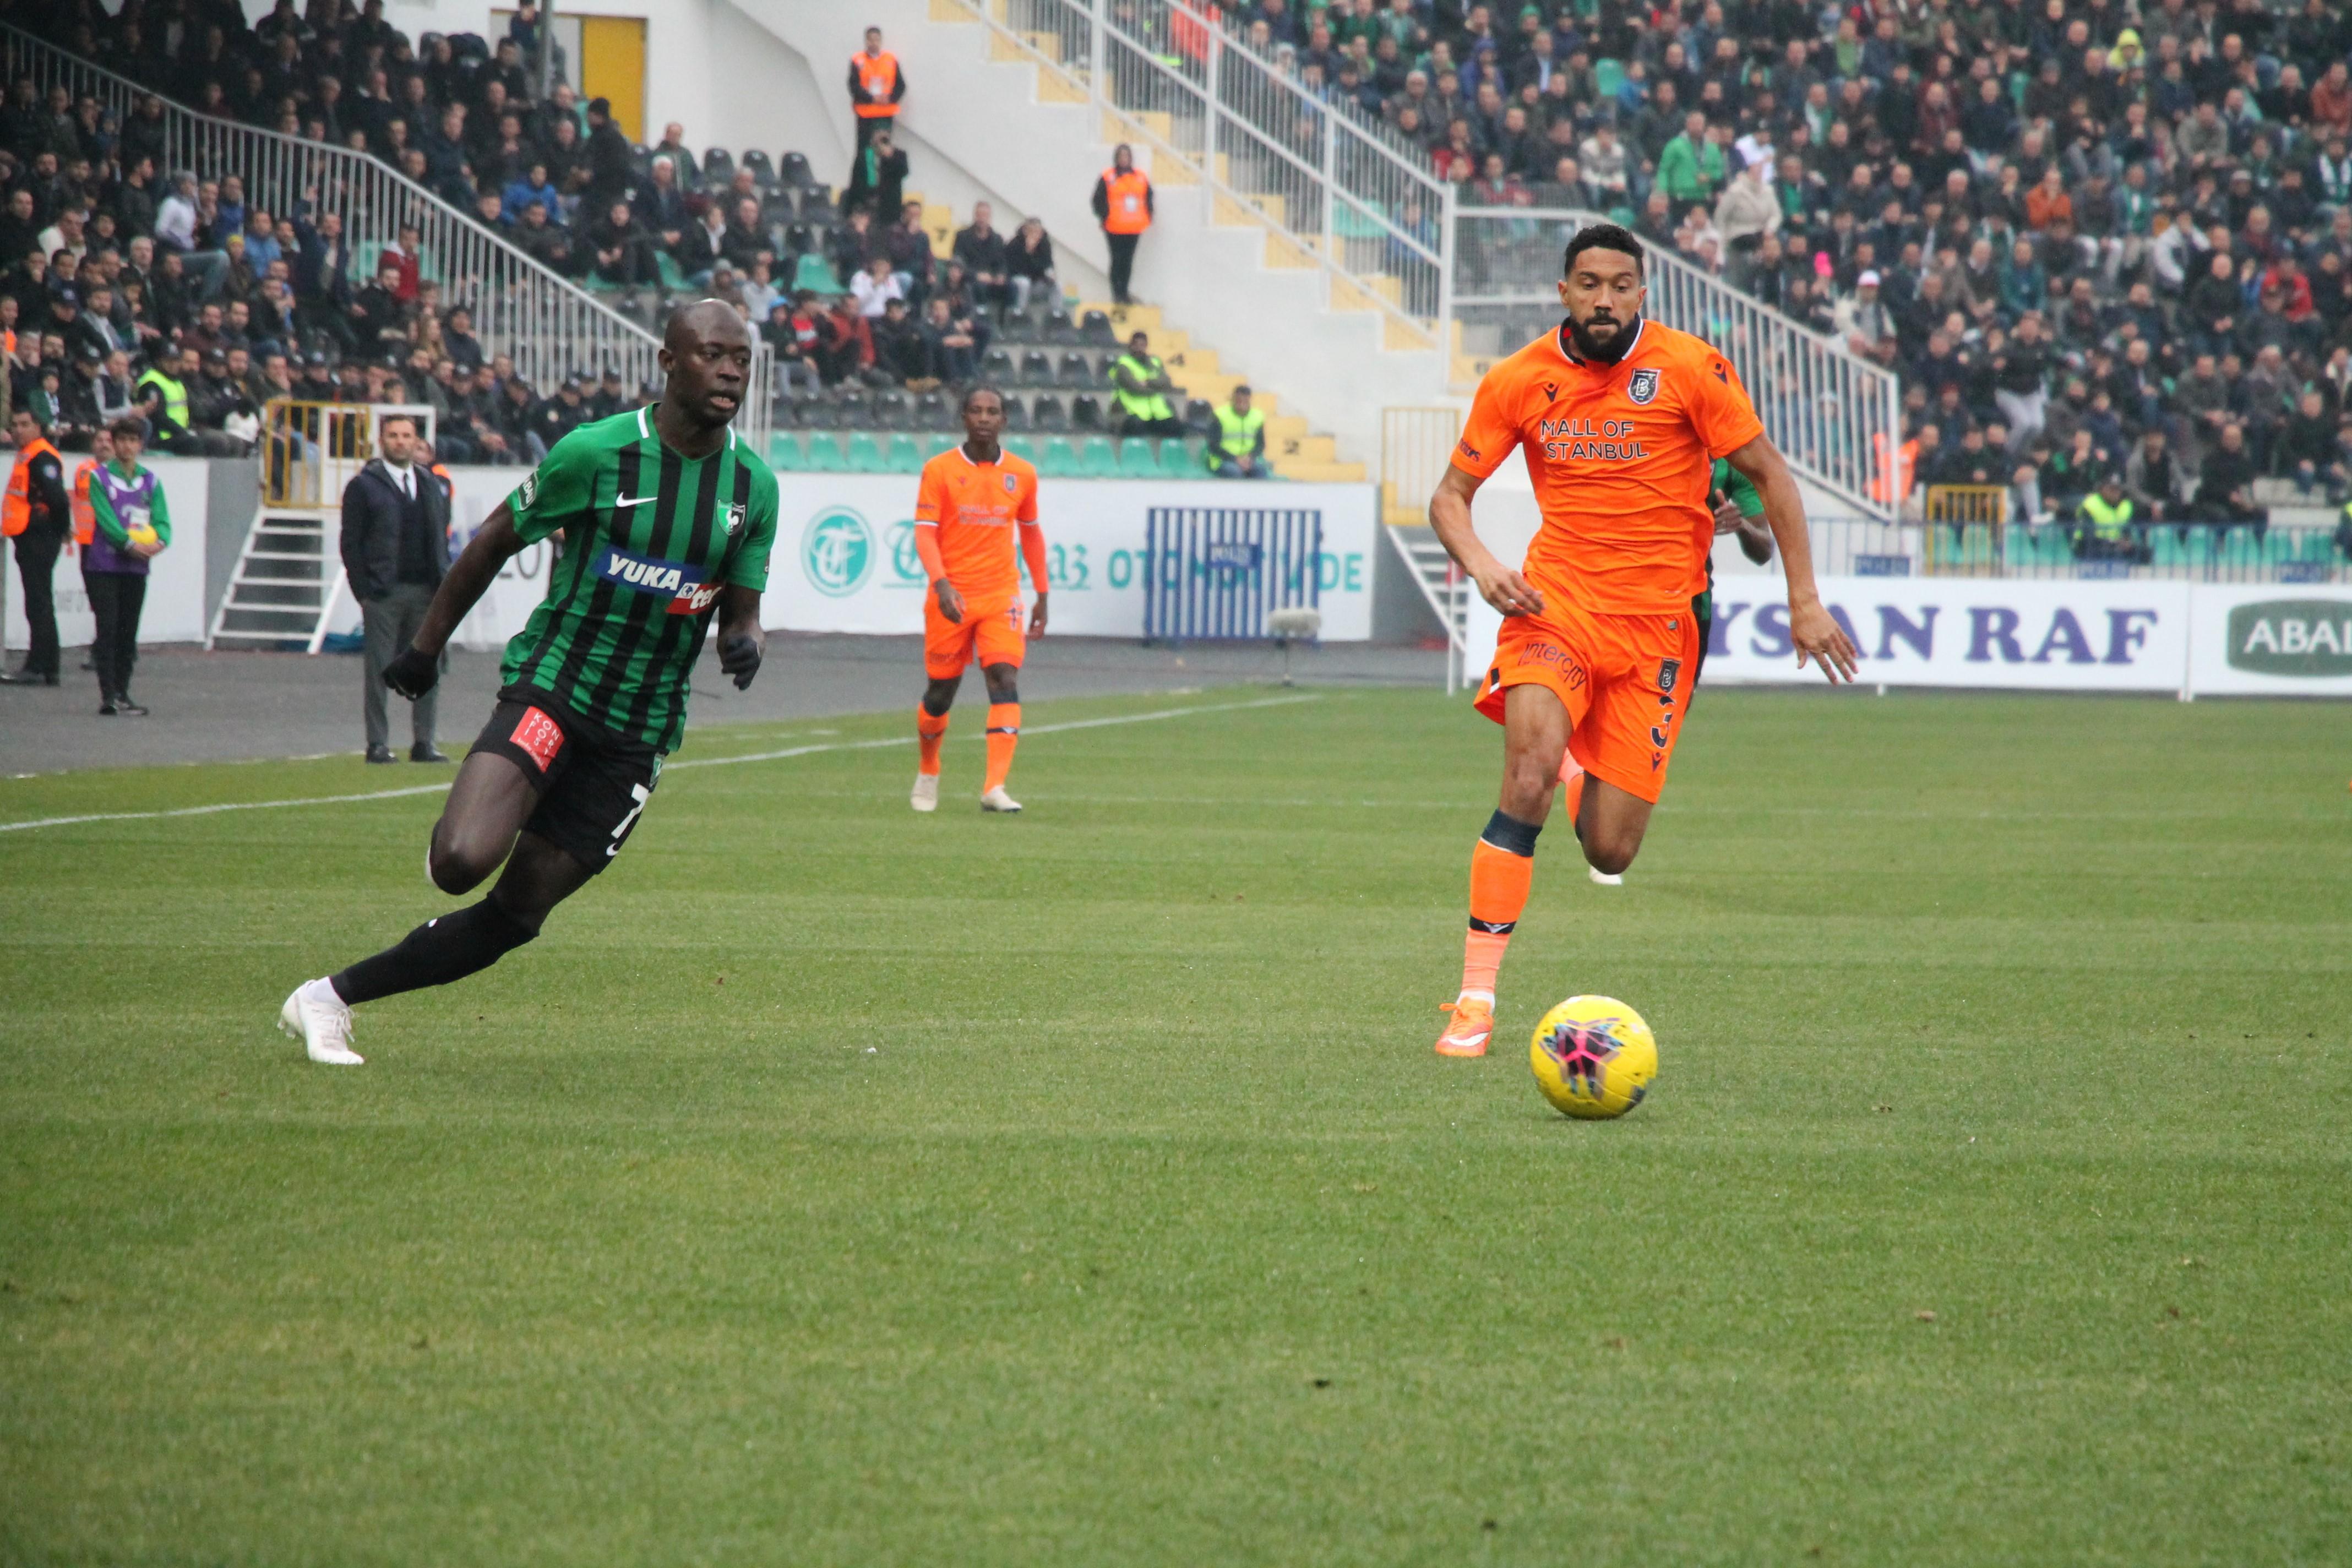 Yukatel Denizlispor v Medipol Basaksehir - Turkish Super Lig